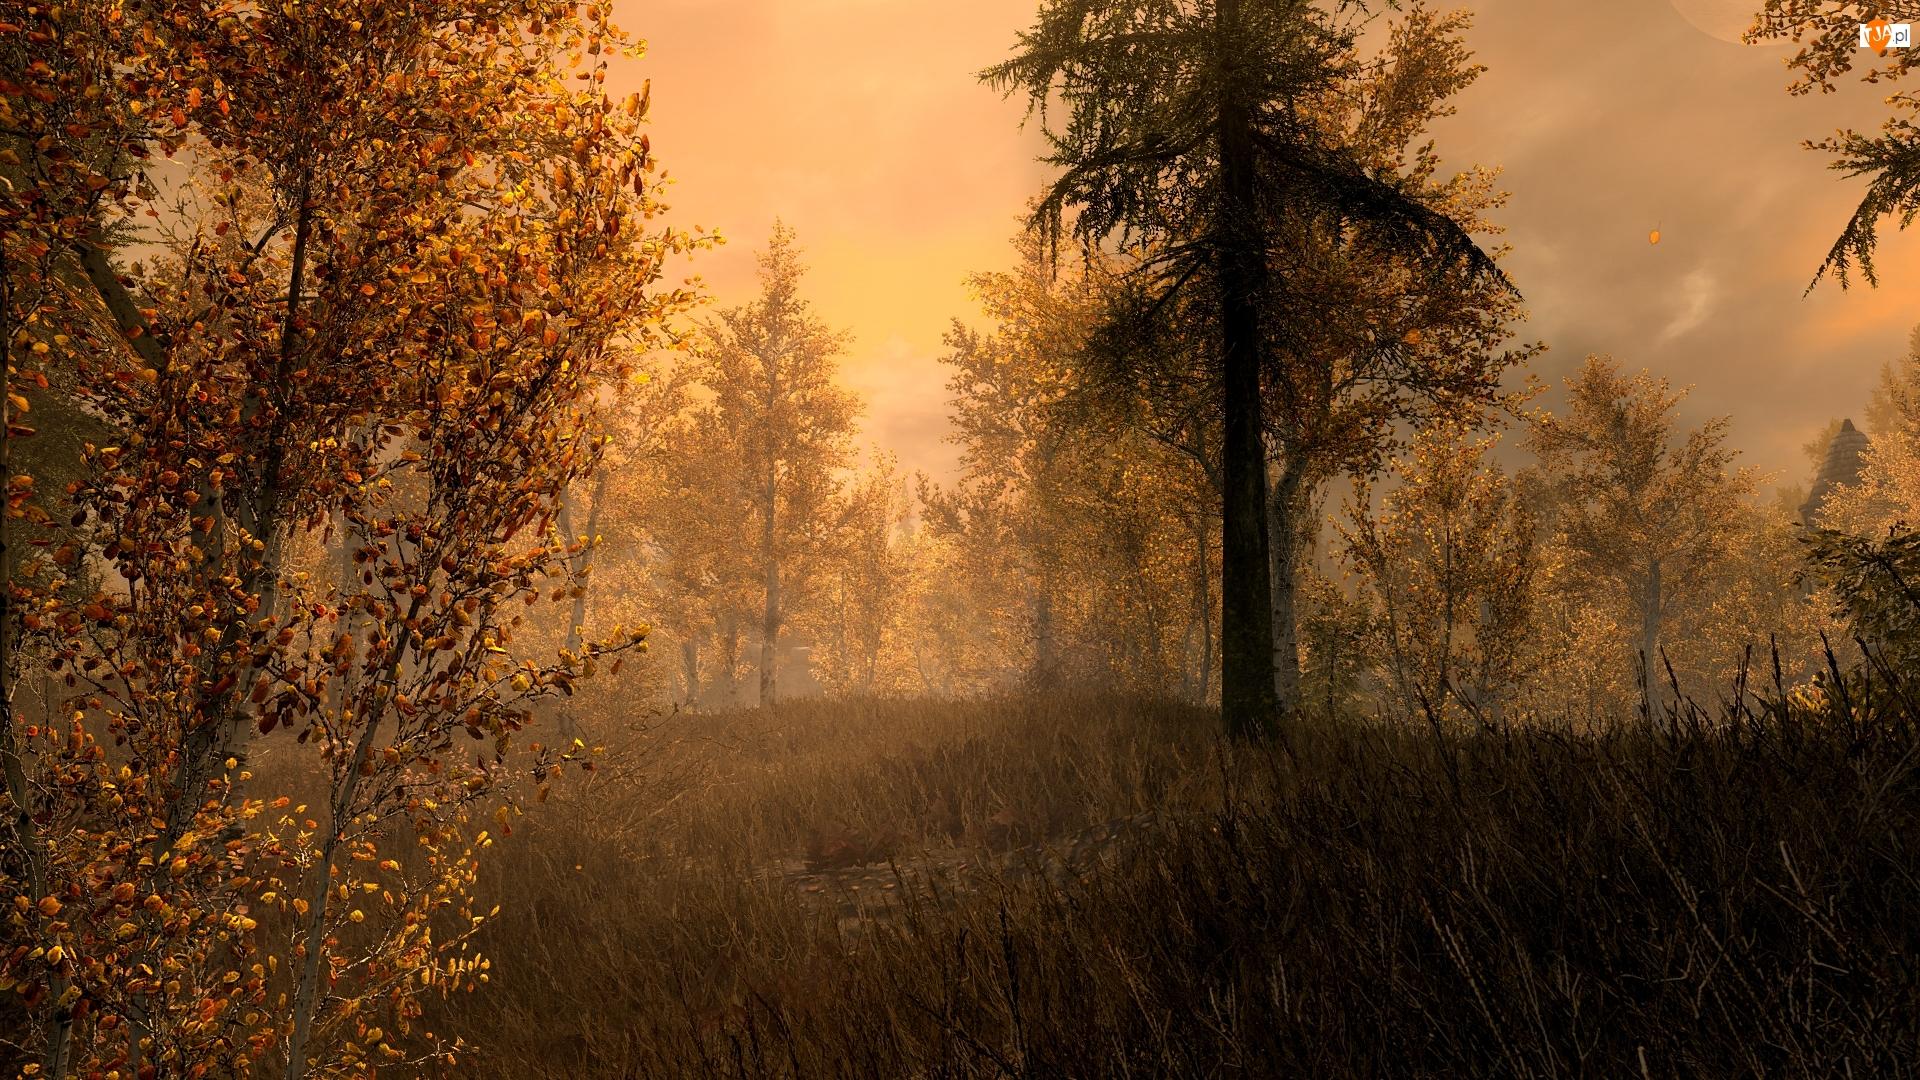 Drzewa, Gra, Jesień, The Elder Scrolls V: Skyrim, Las